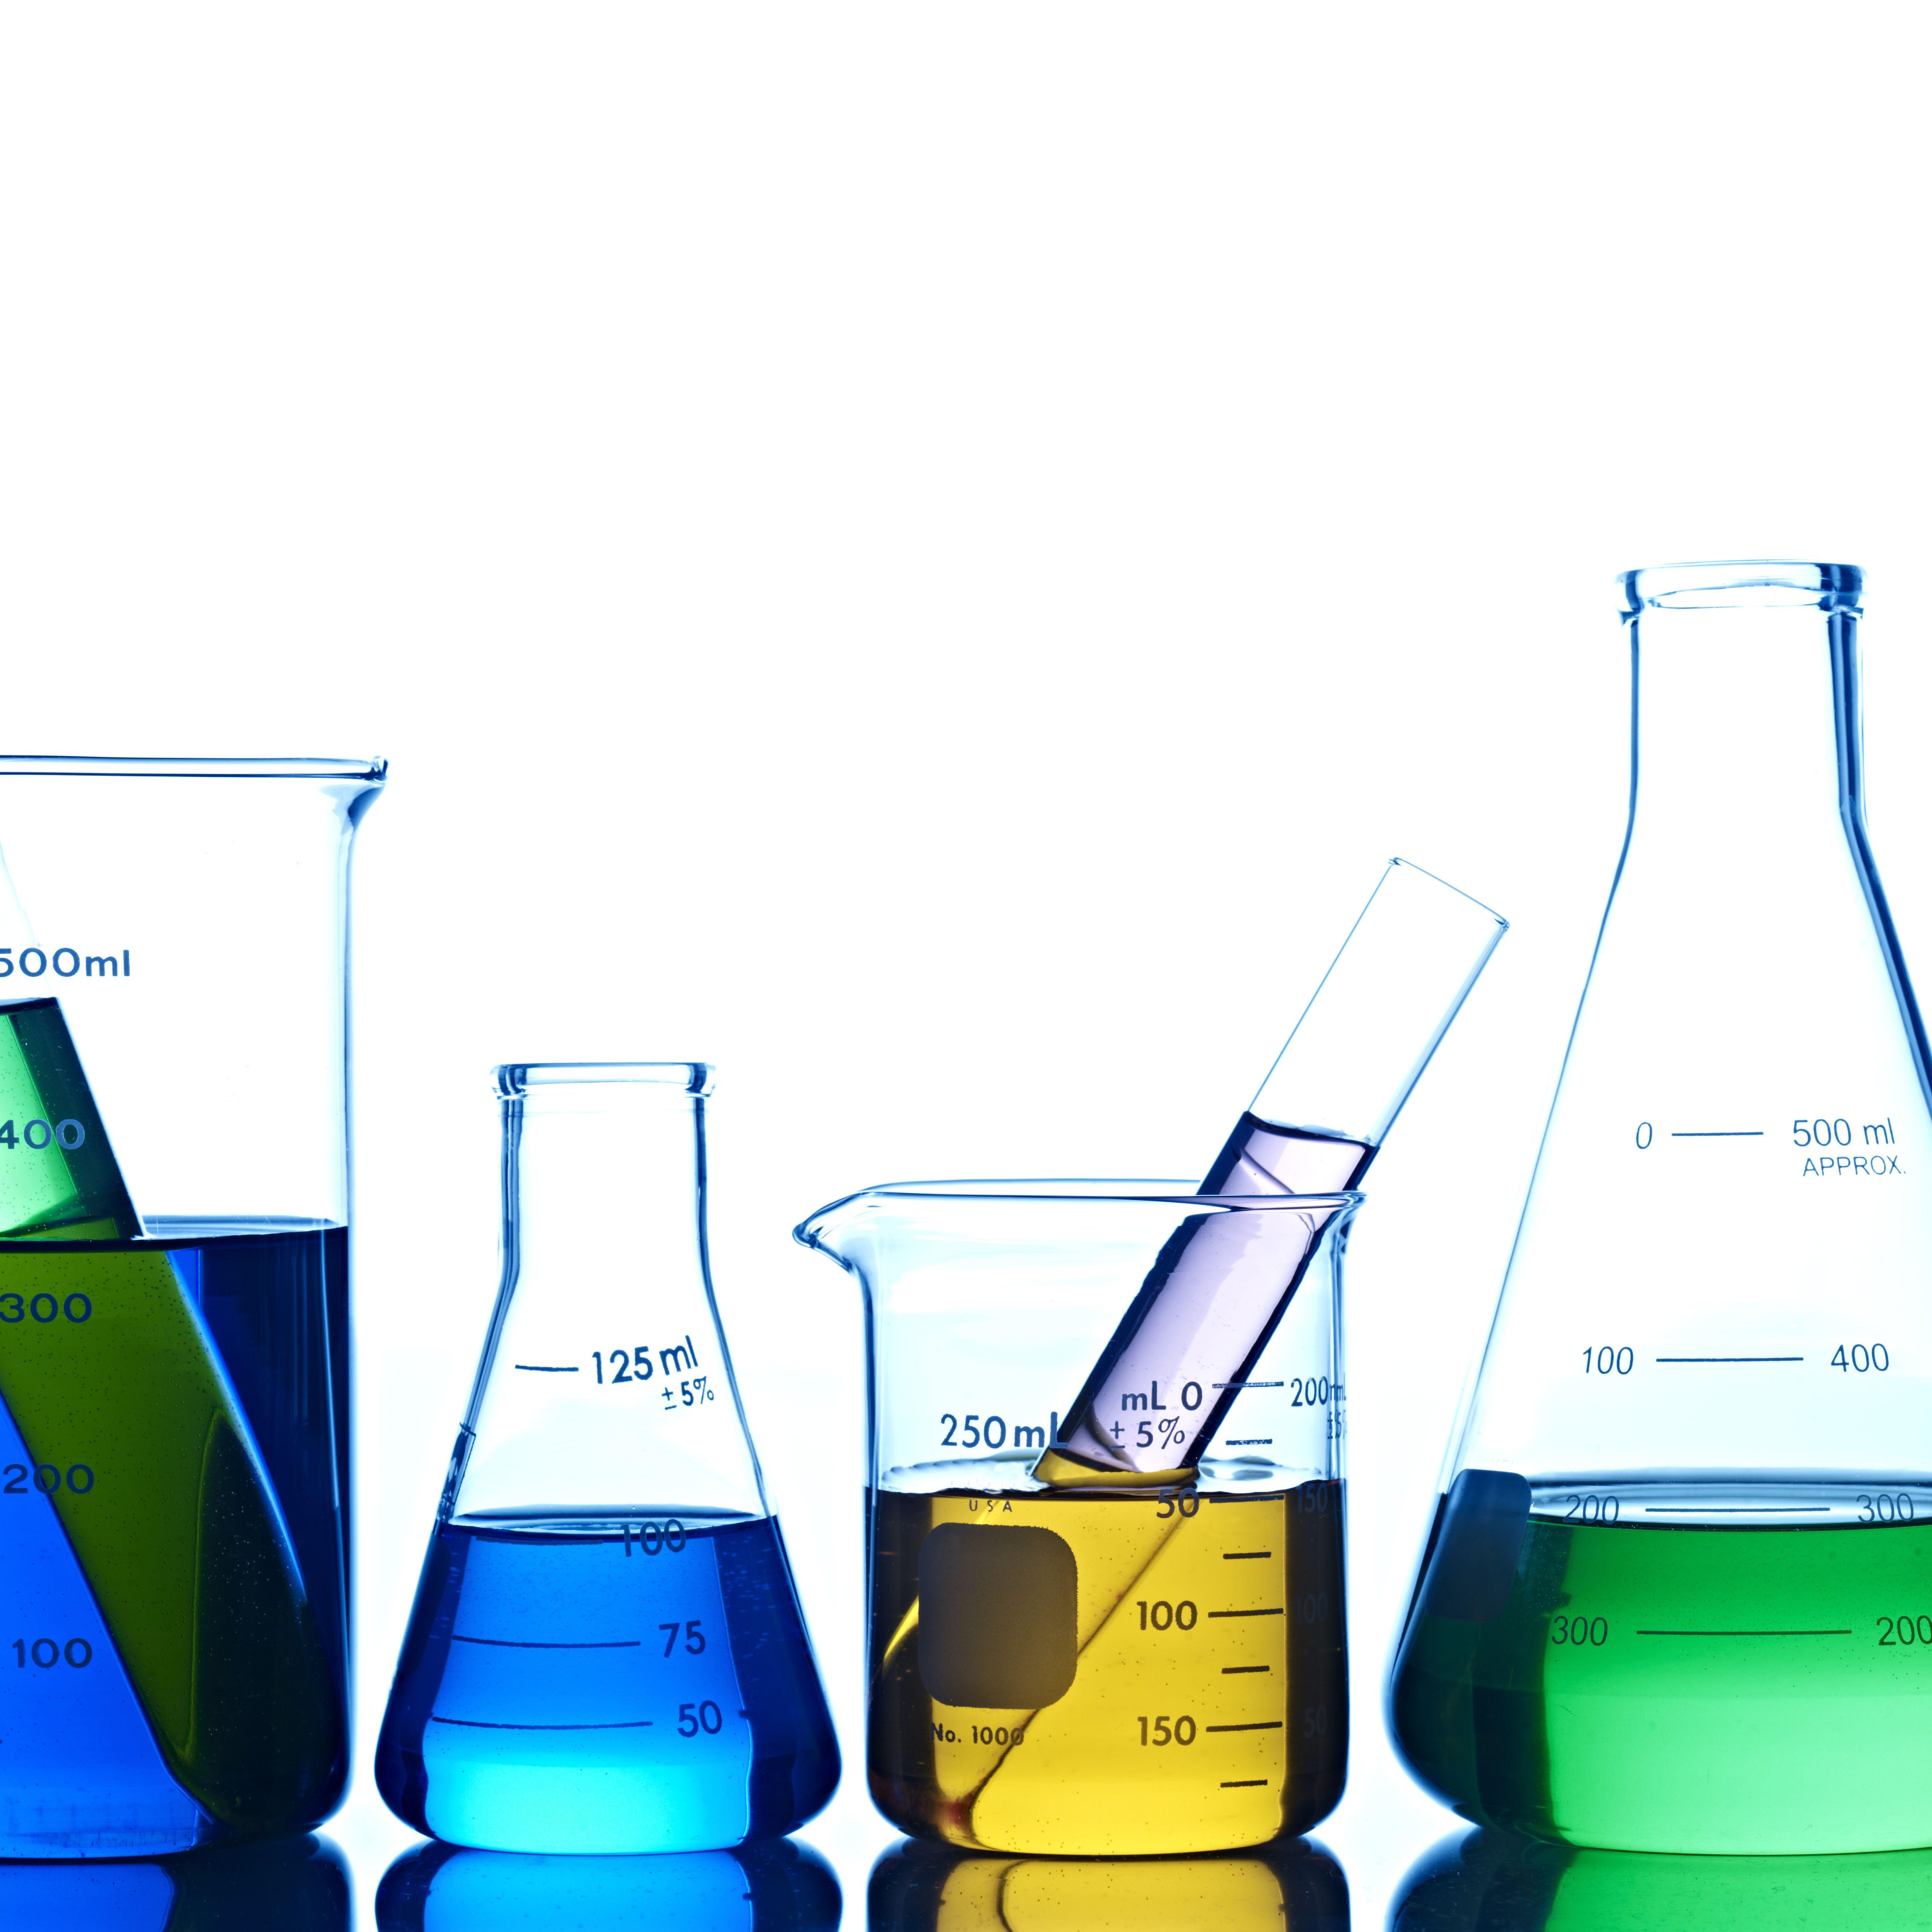 pKa Definition in Chemistry